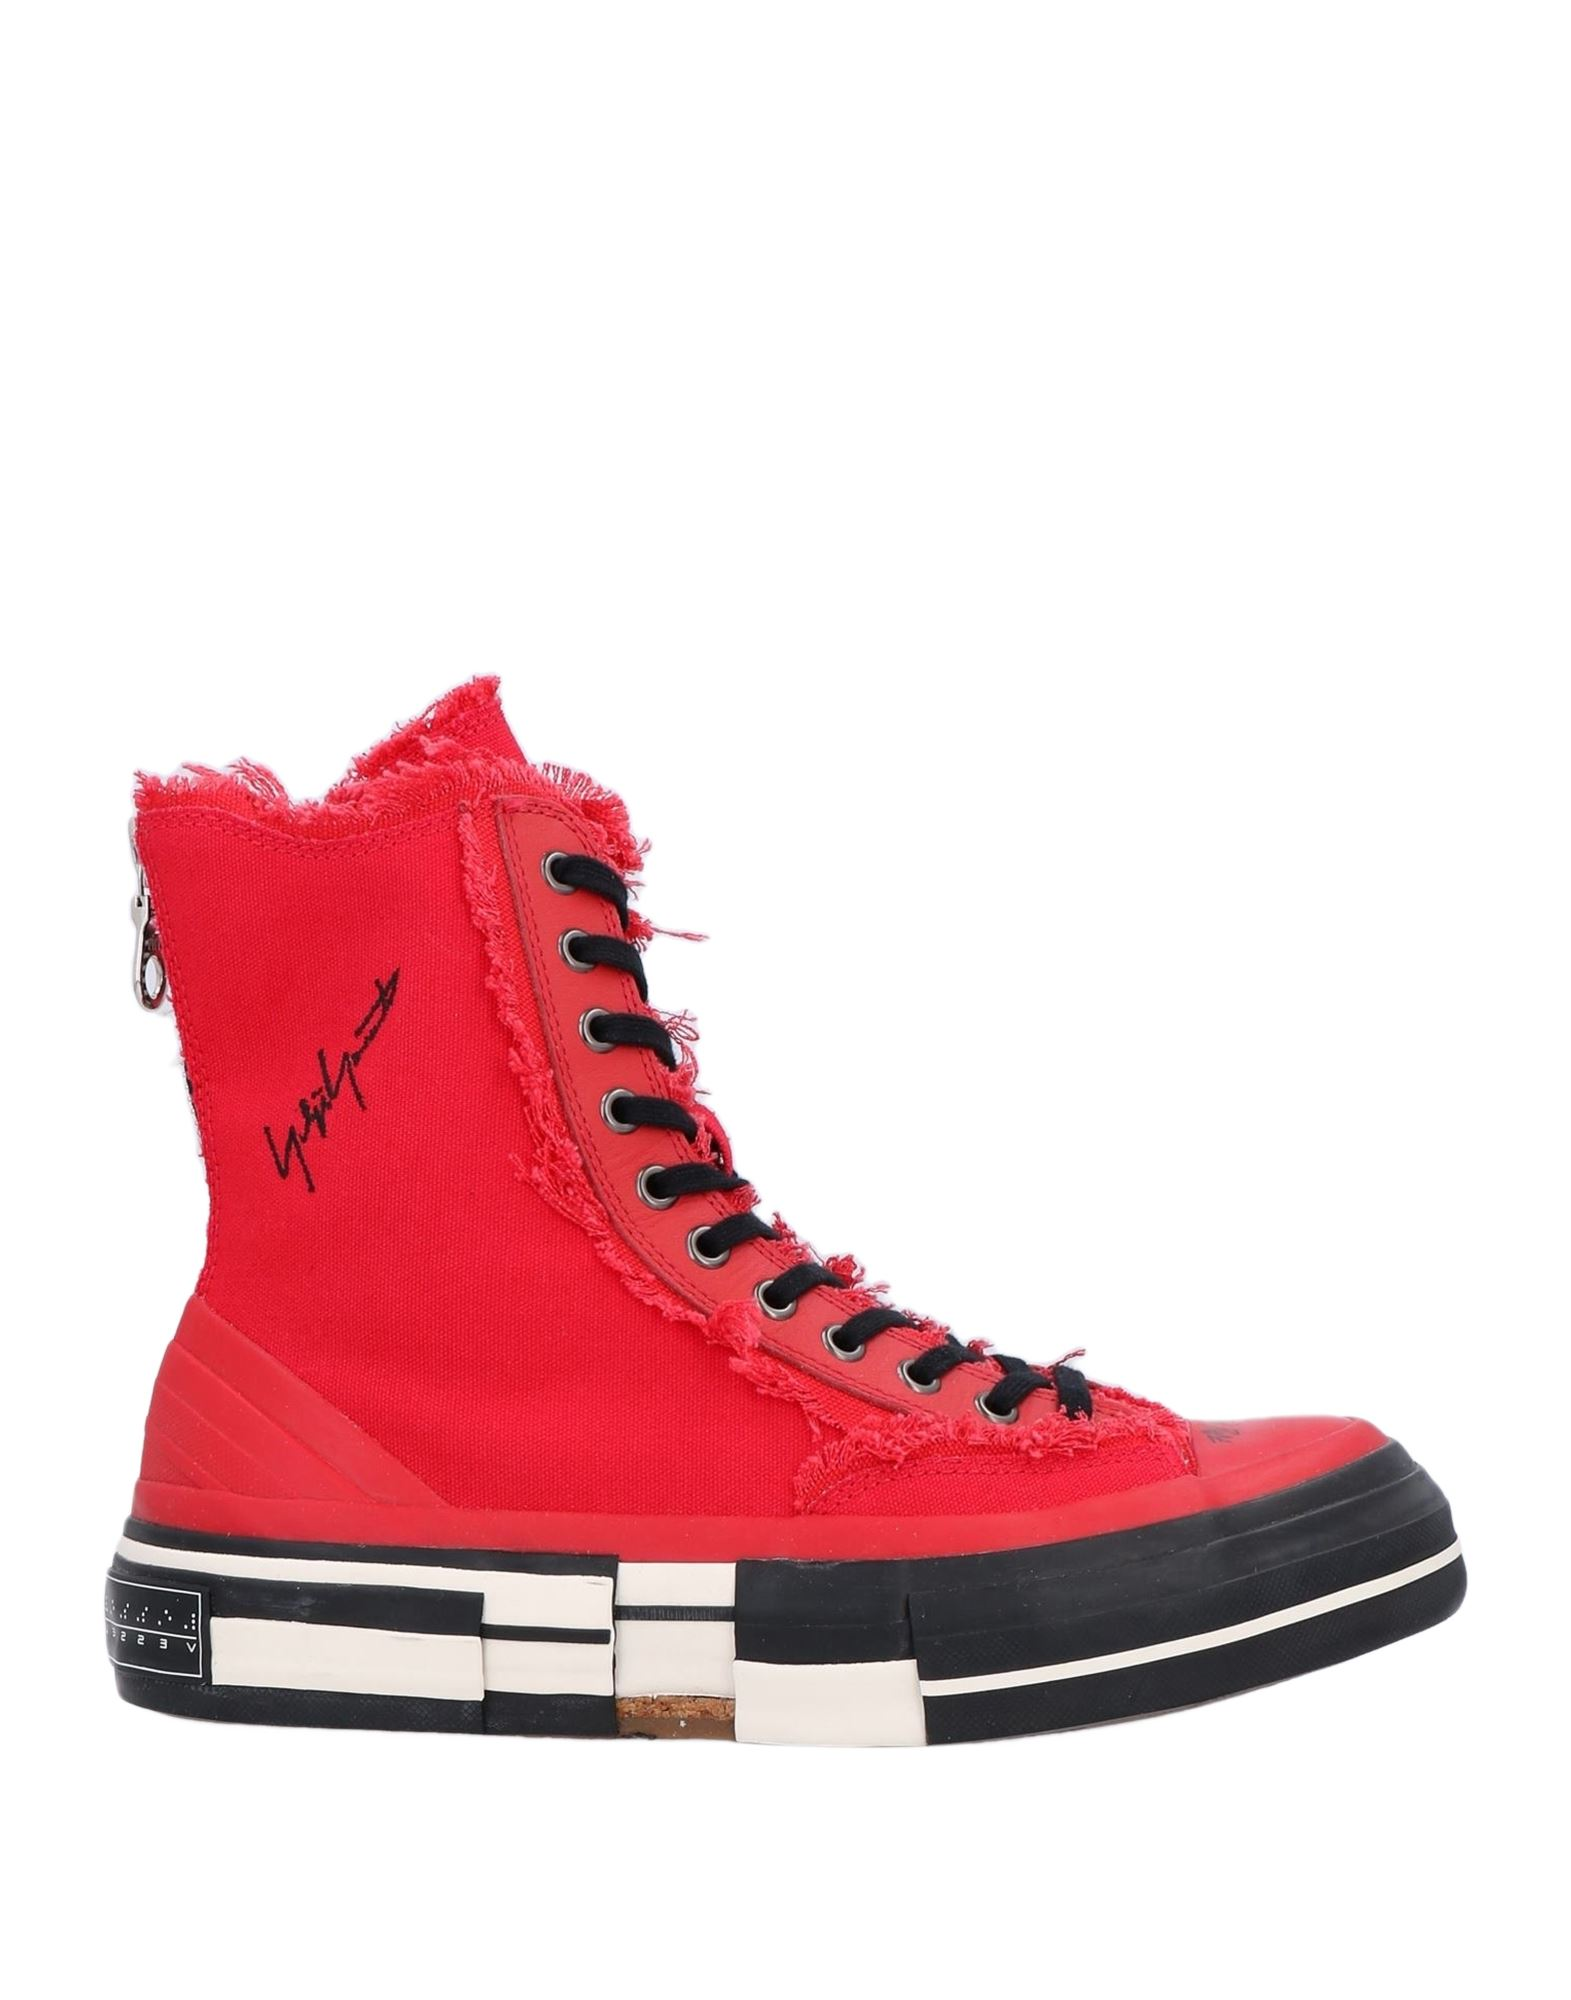 YOHJI YAMAMOTO x XVESSEL Полусапоги и высокие ботинки yohji yamamoto высокие кеды и кроссовки